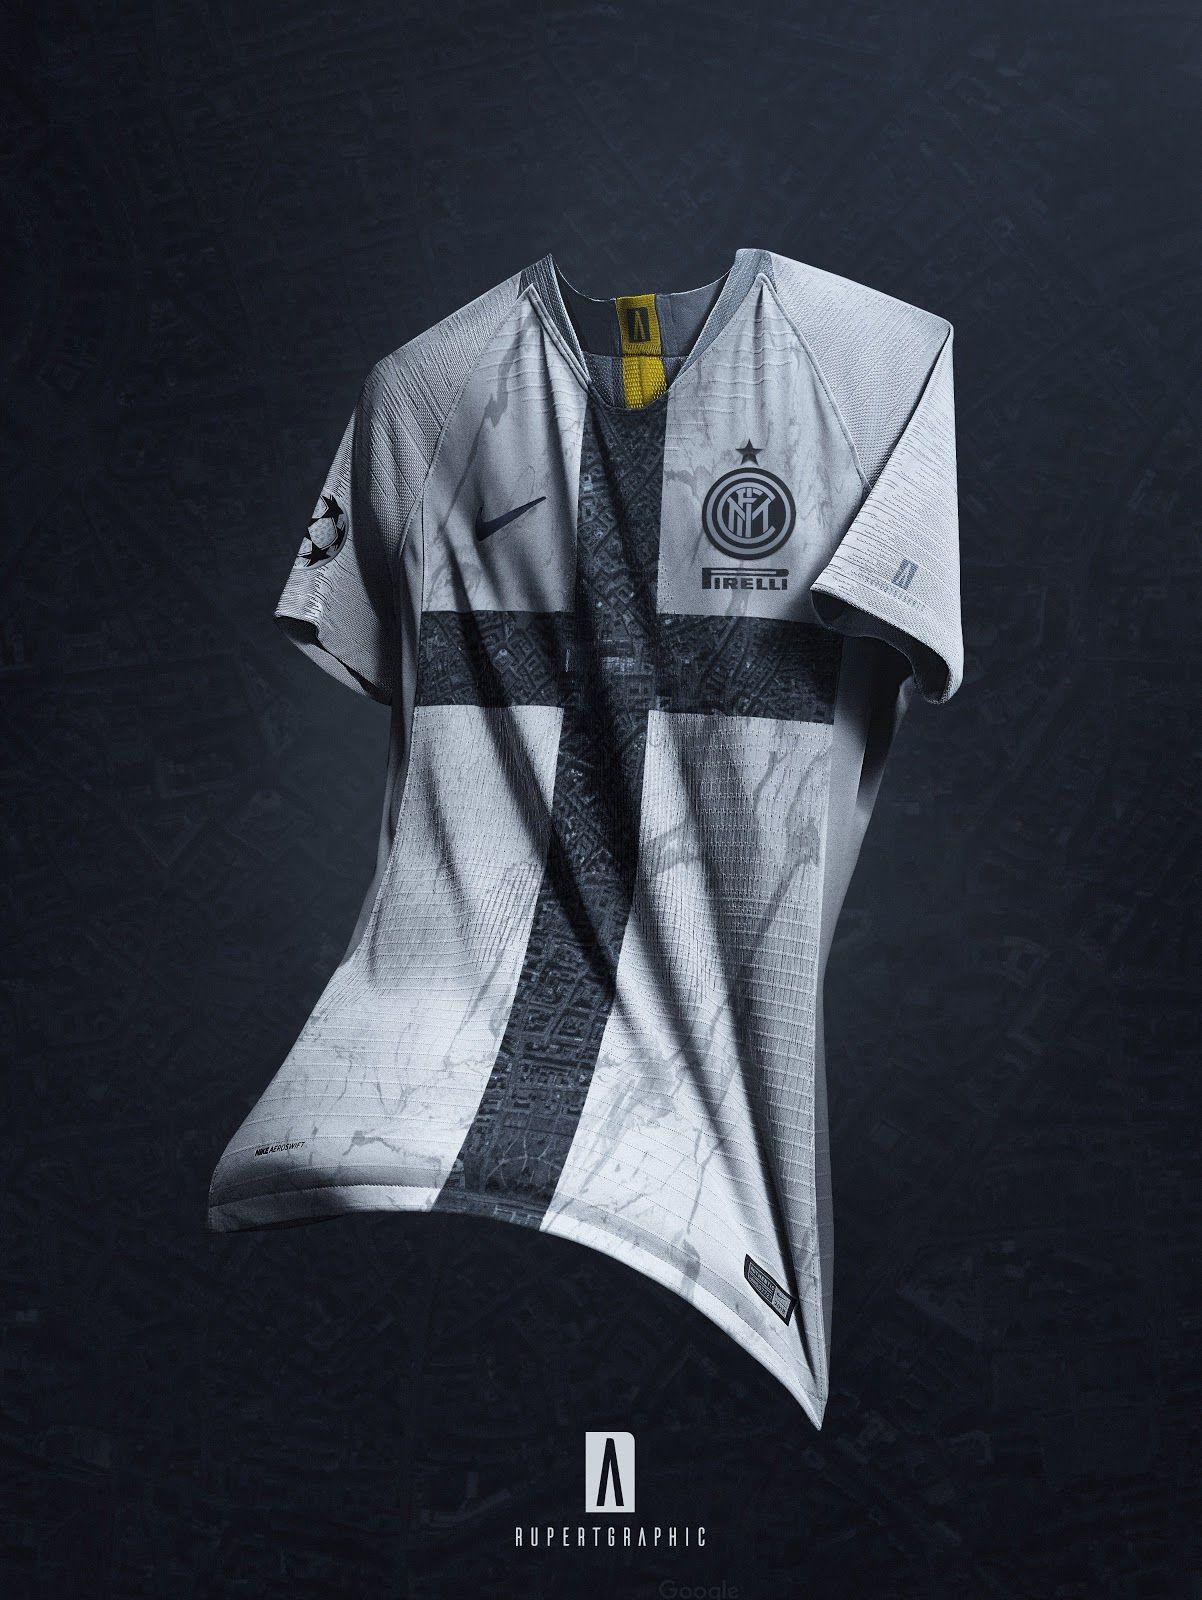 21627f4bc1 Update  Nike Inter Milan 18-19 Third Kit Leaked - Footy Headlines ...